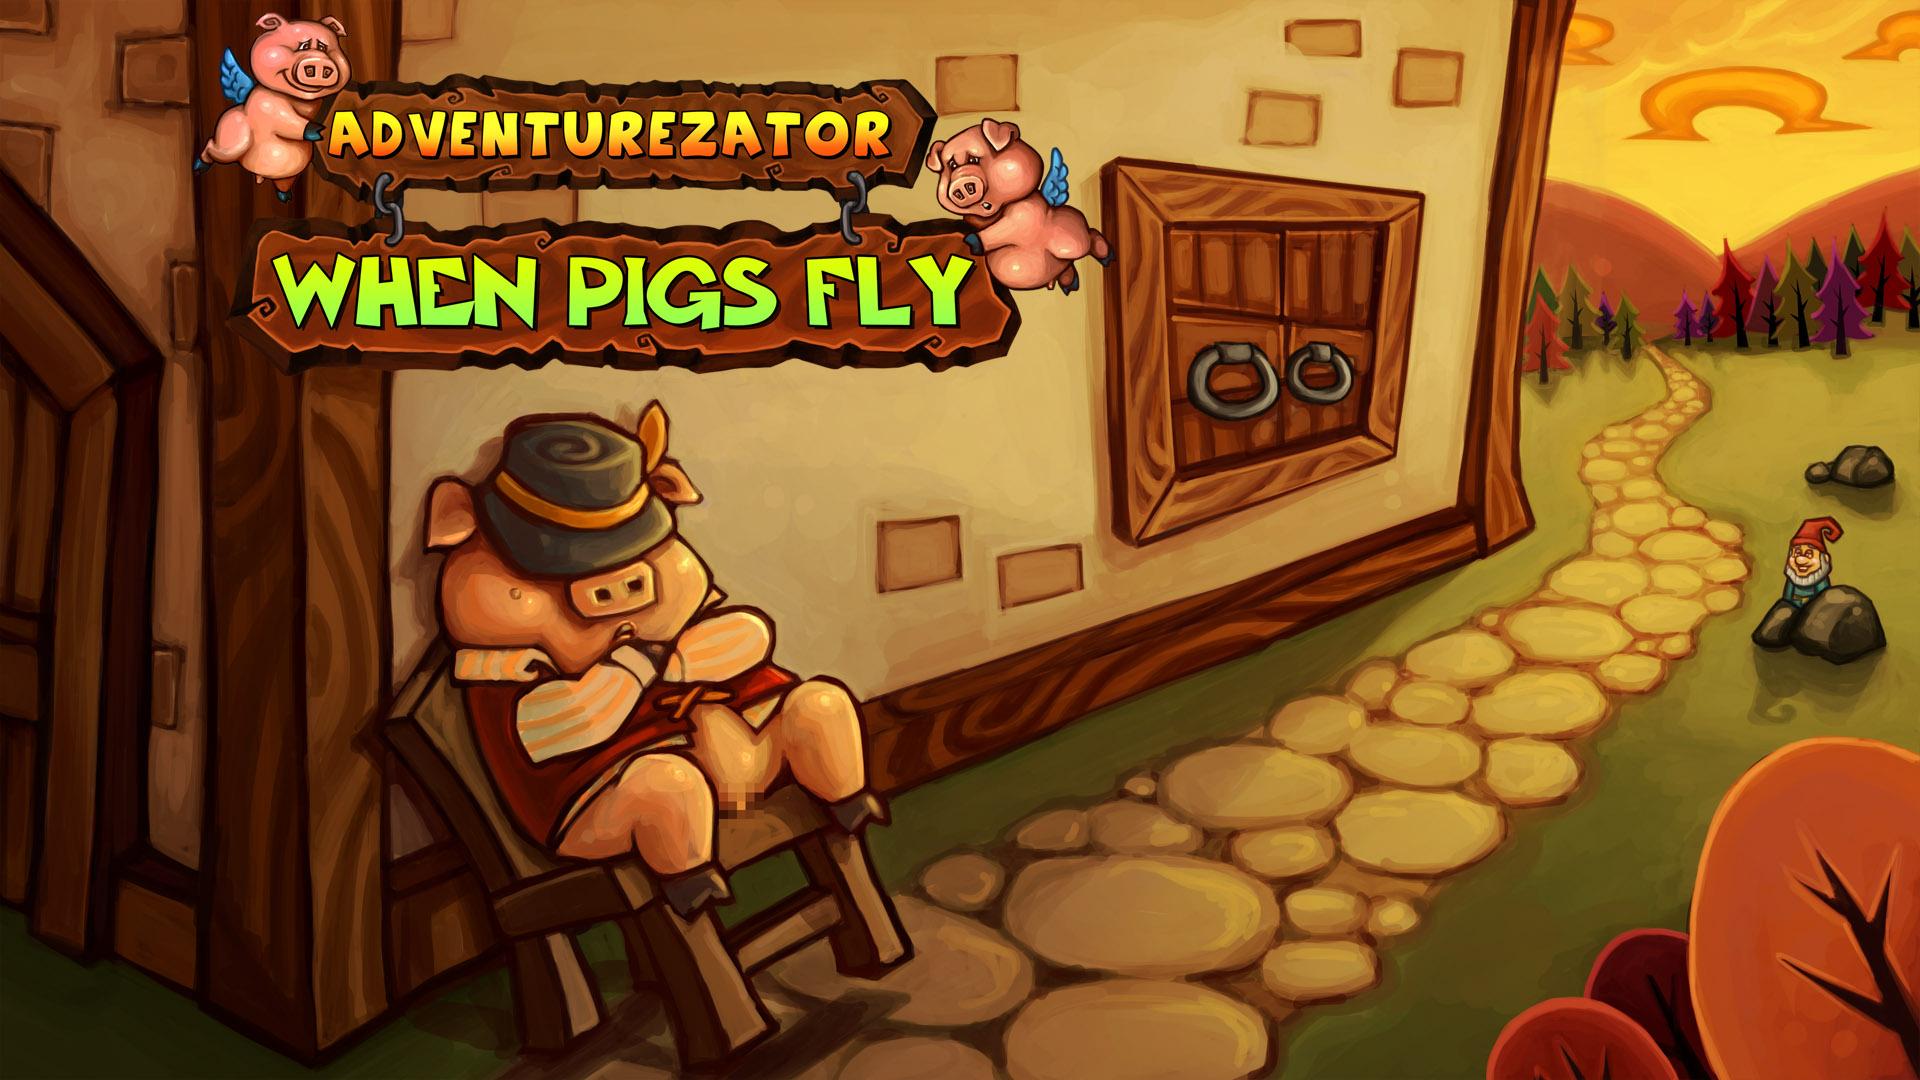 Adventurezator: When Pigs Fly Backgrounds, Compatible - PC, Mobile, Gadgets| 1920x1080 px